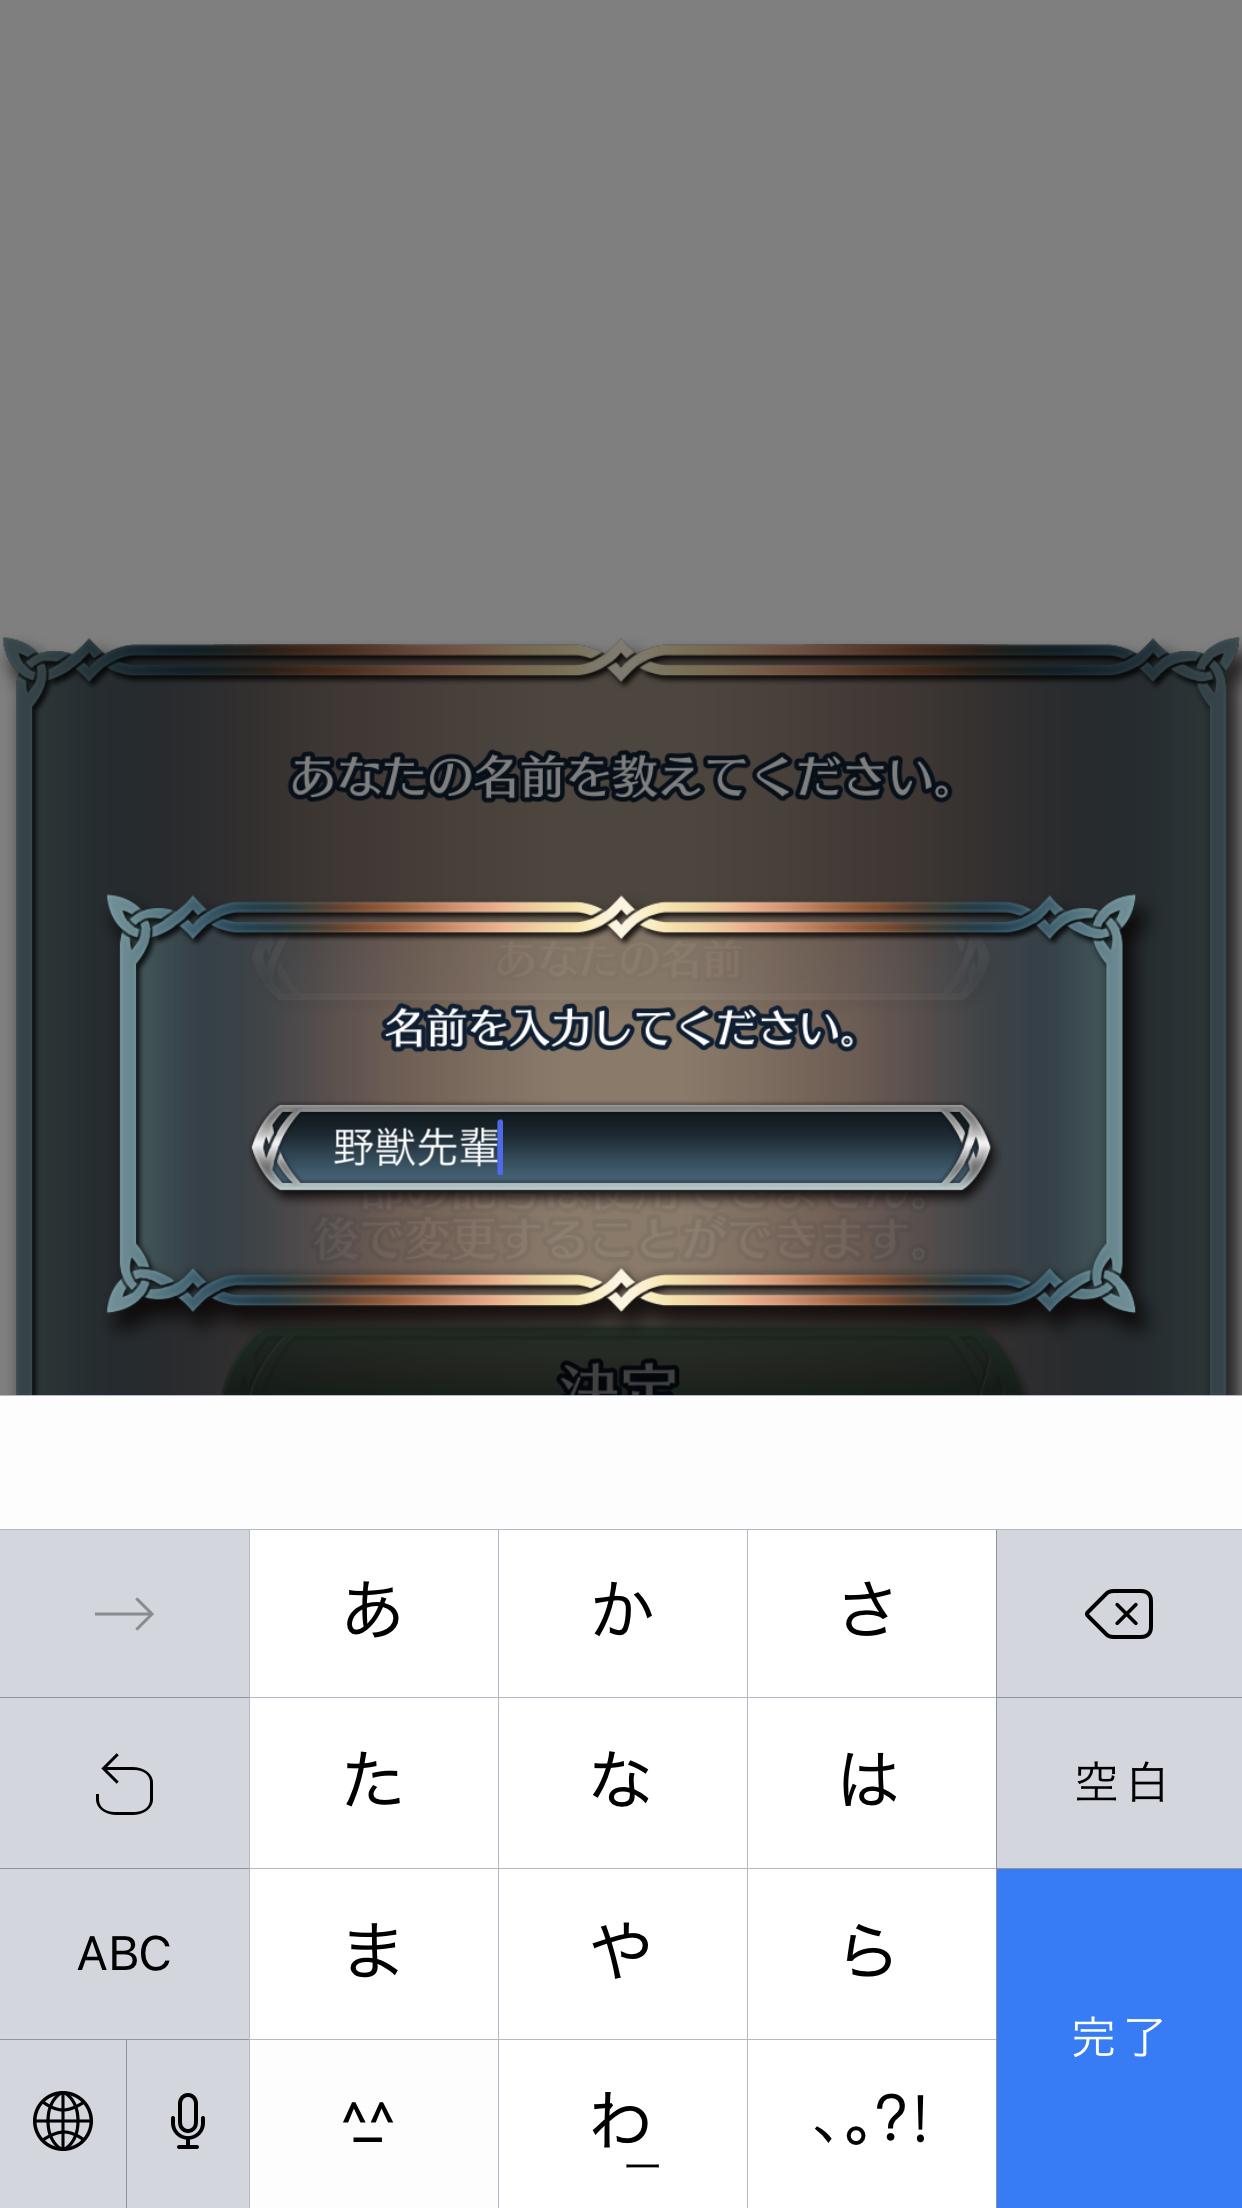 yPsm9tG.jpg